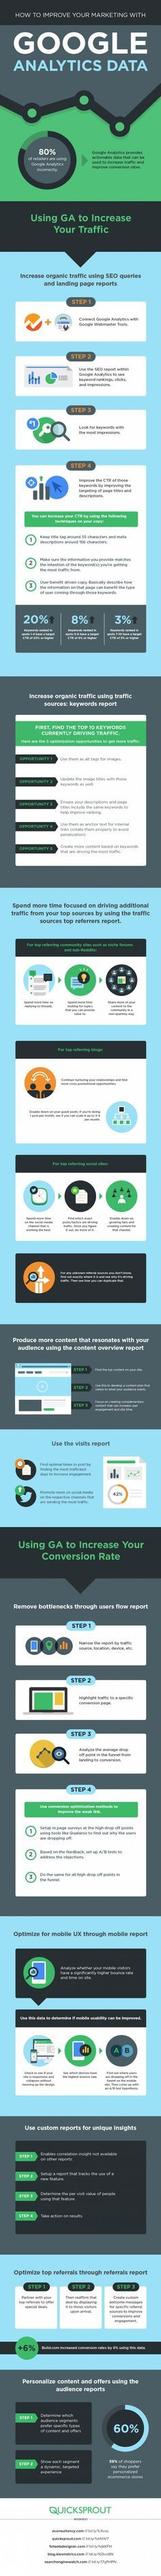 Using Google Analytics to improve your Digital Marketing [Infographic]  Latest News & Trends in #digitalmarketing 2015 | http://webworksagency.com